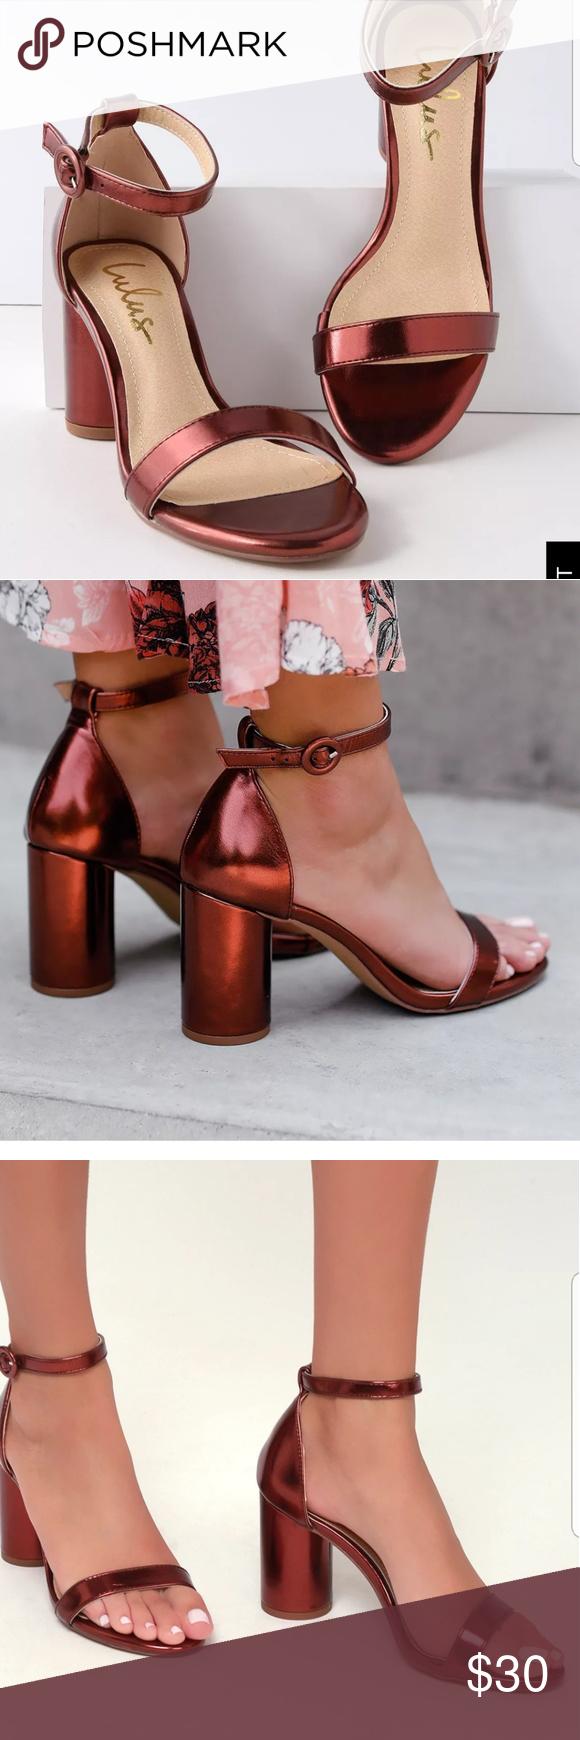 6ade7927d57 Lulu s copper block sandals Brand New